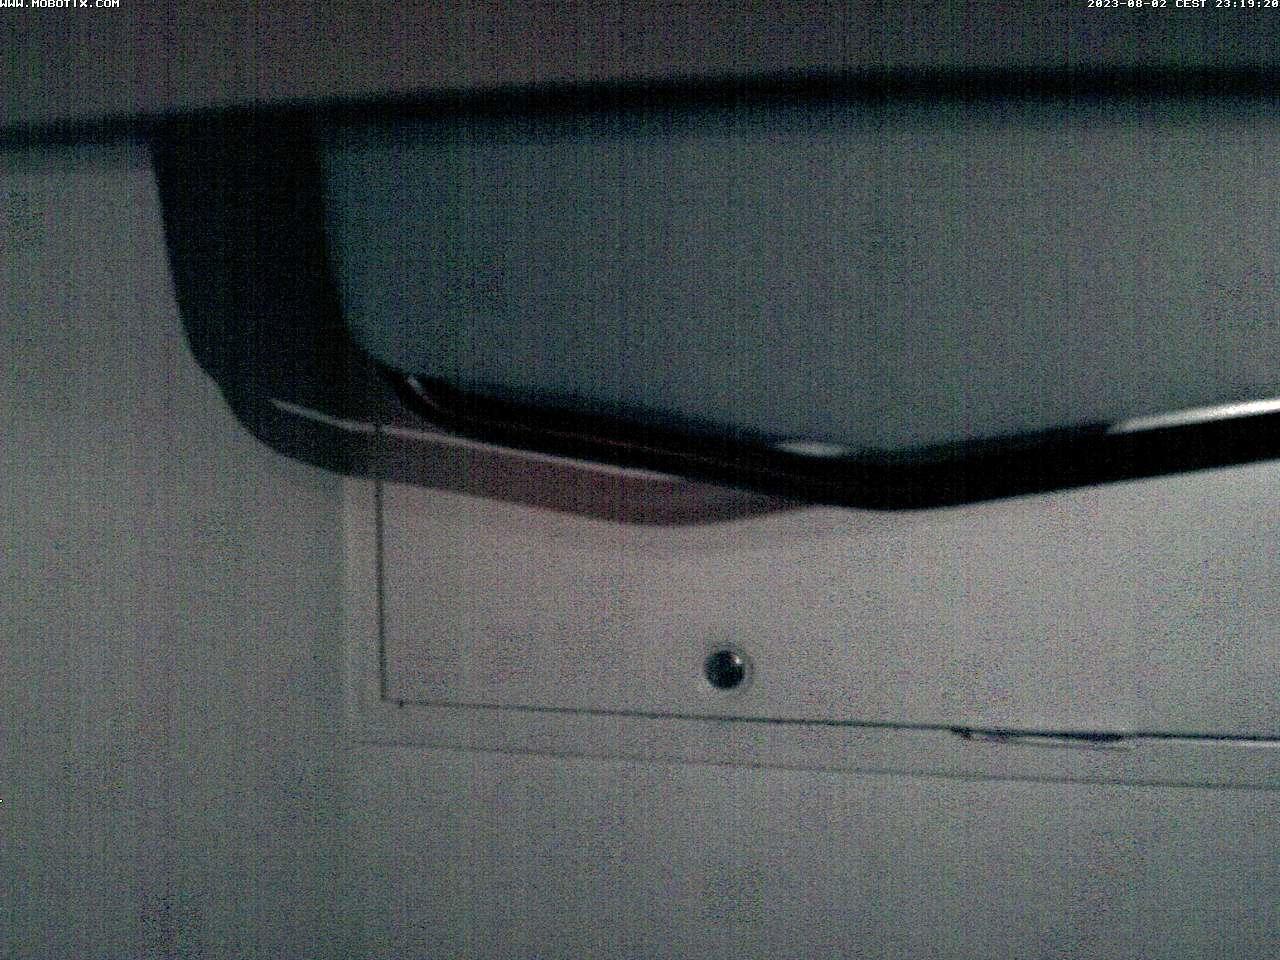 Webcam: Blick auf den Hauptstraßenzug in Richtung Nordstadt